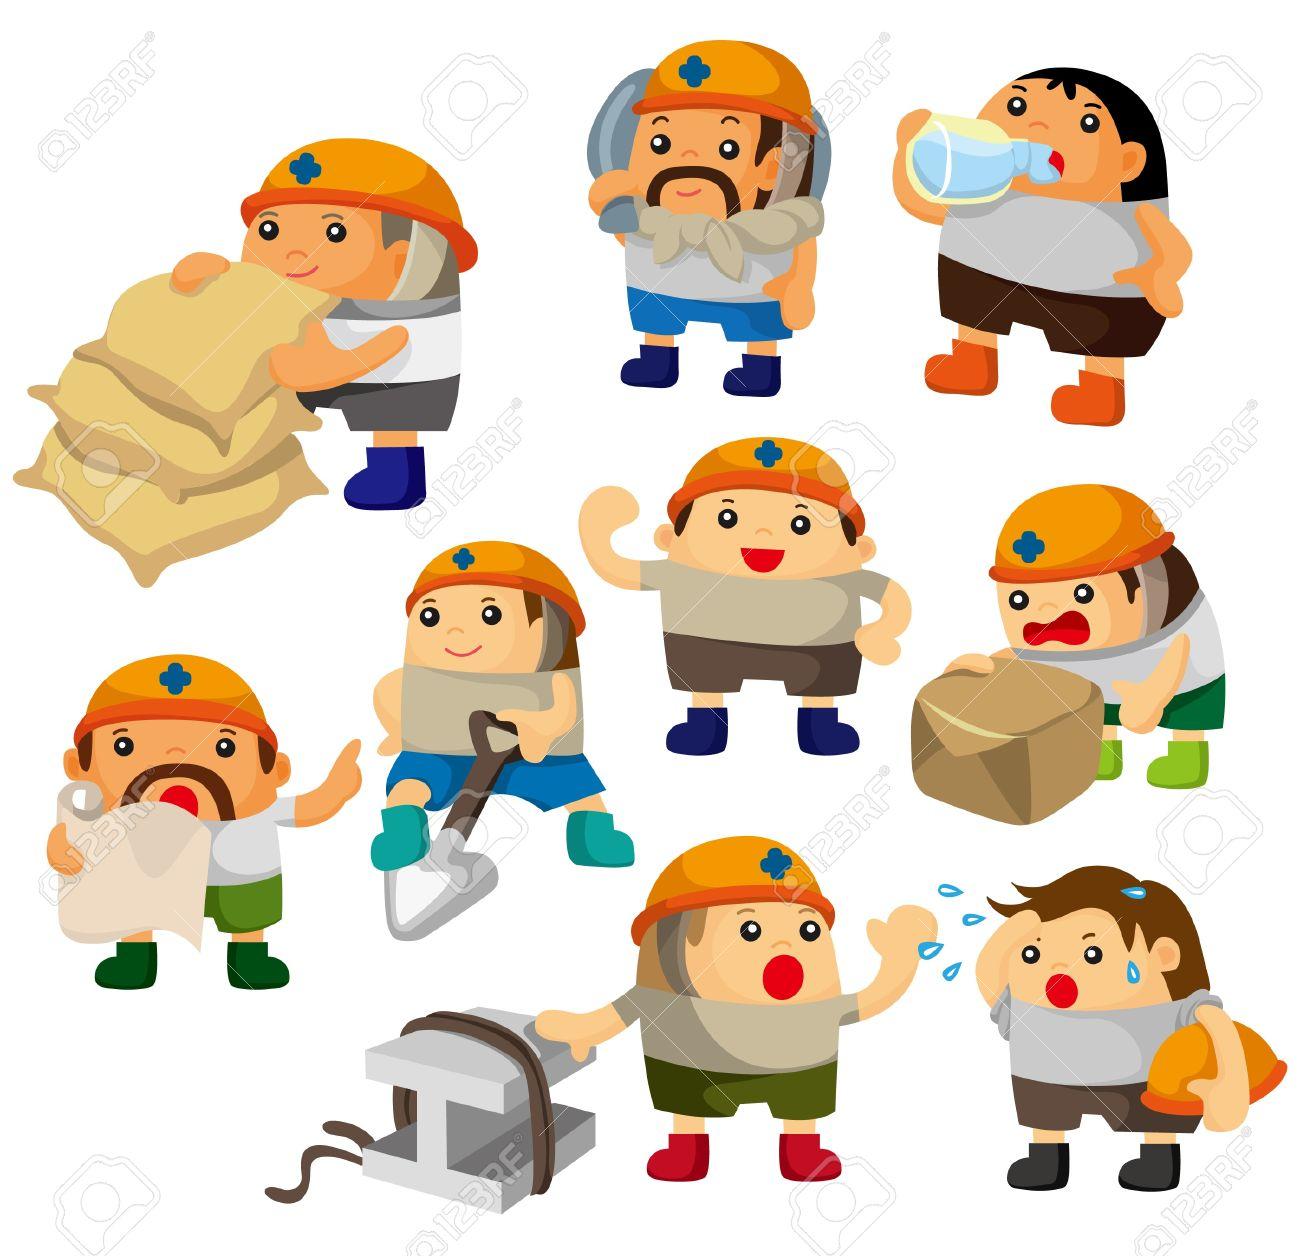 cartoon worker icon Stock Vector - 9190581